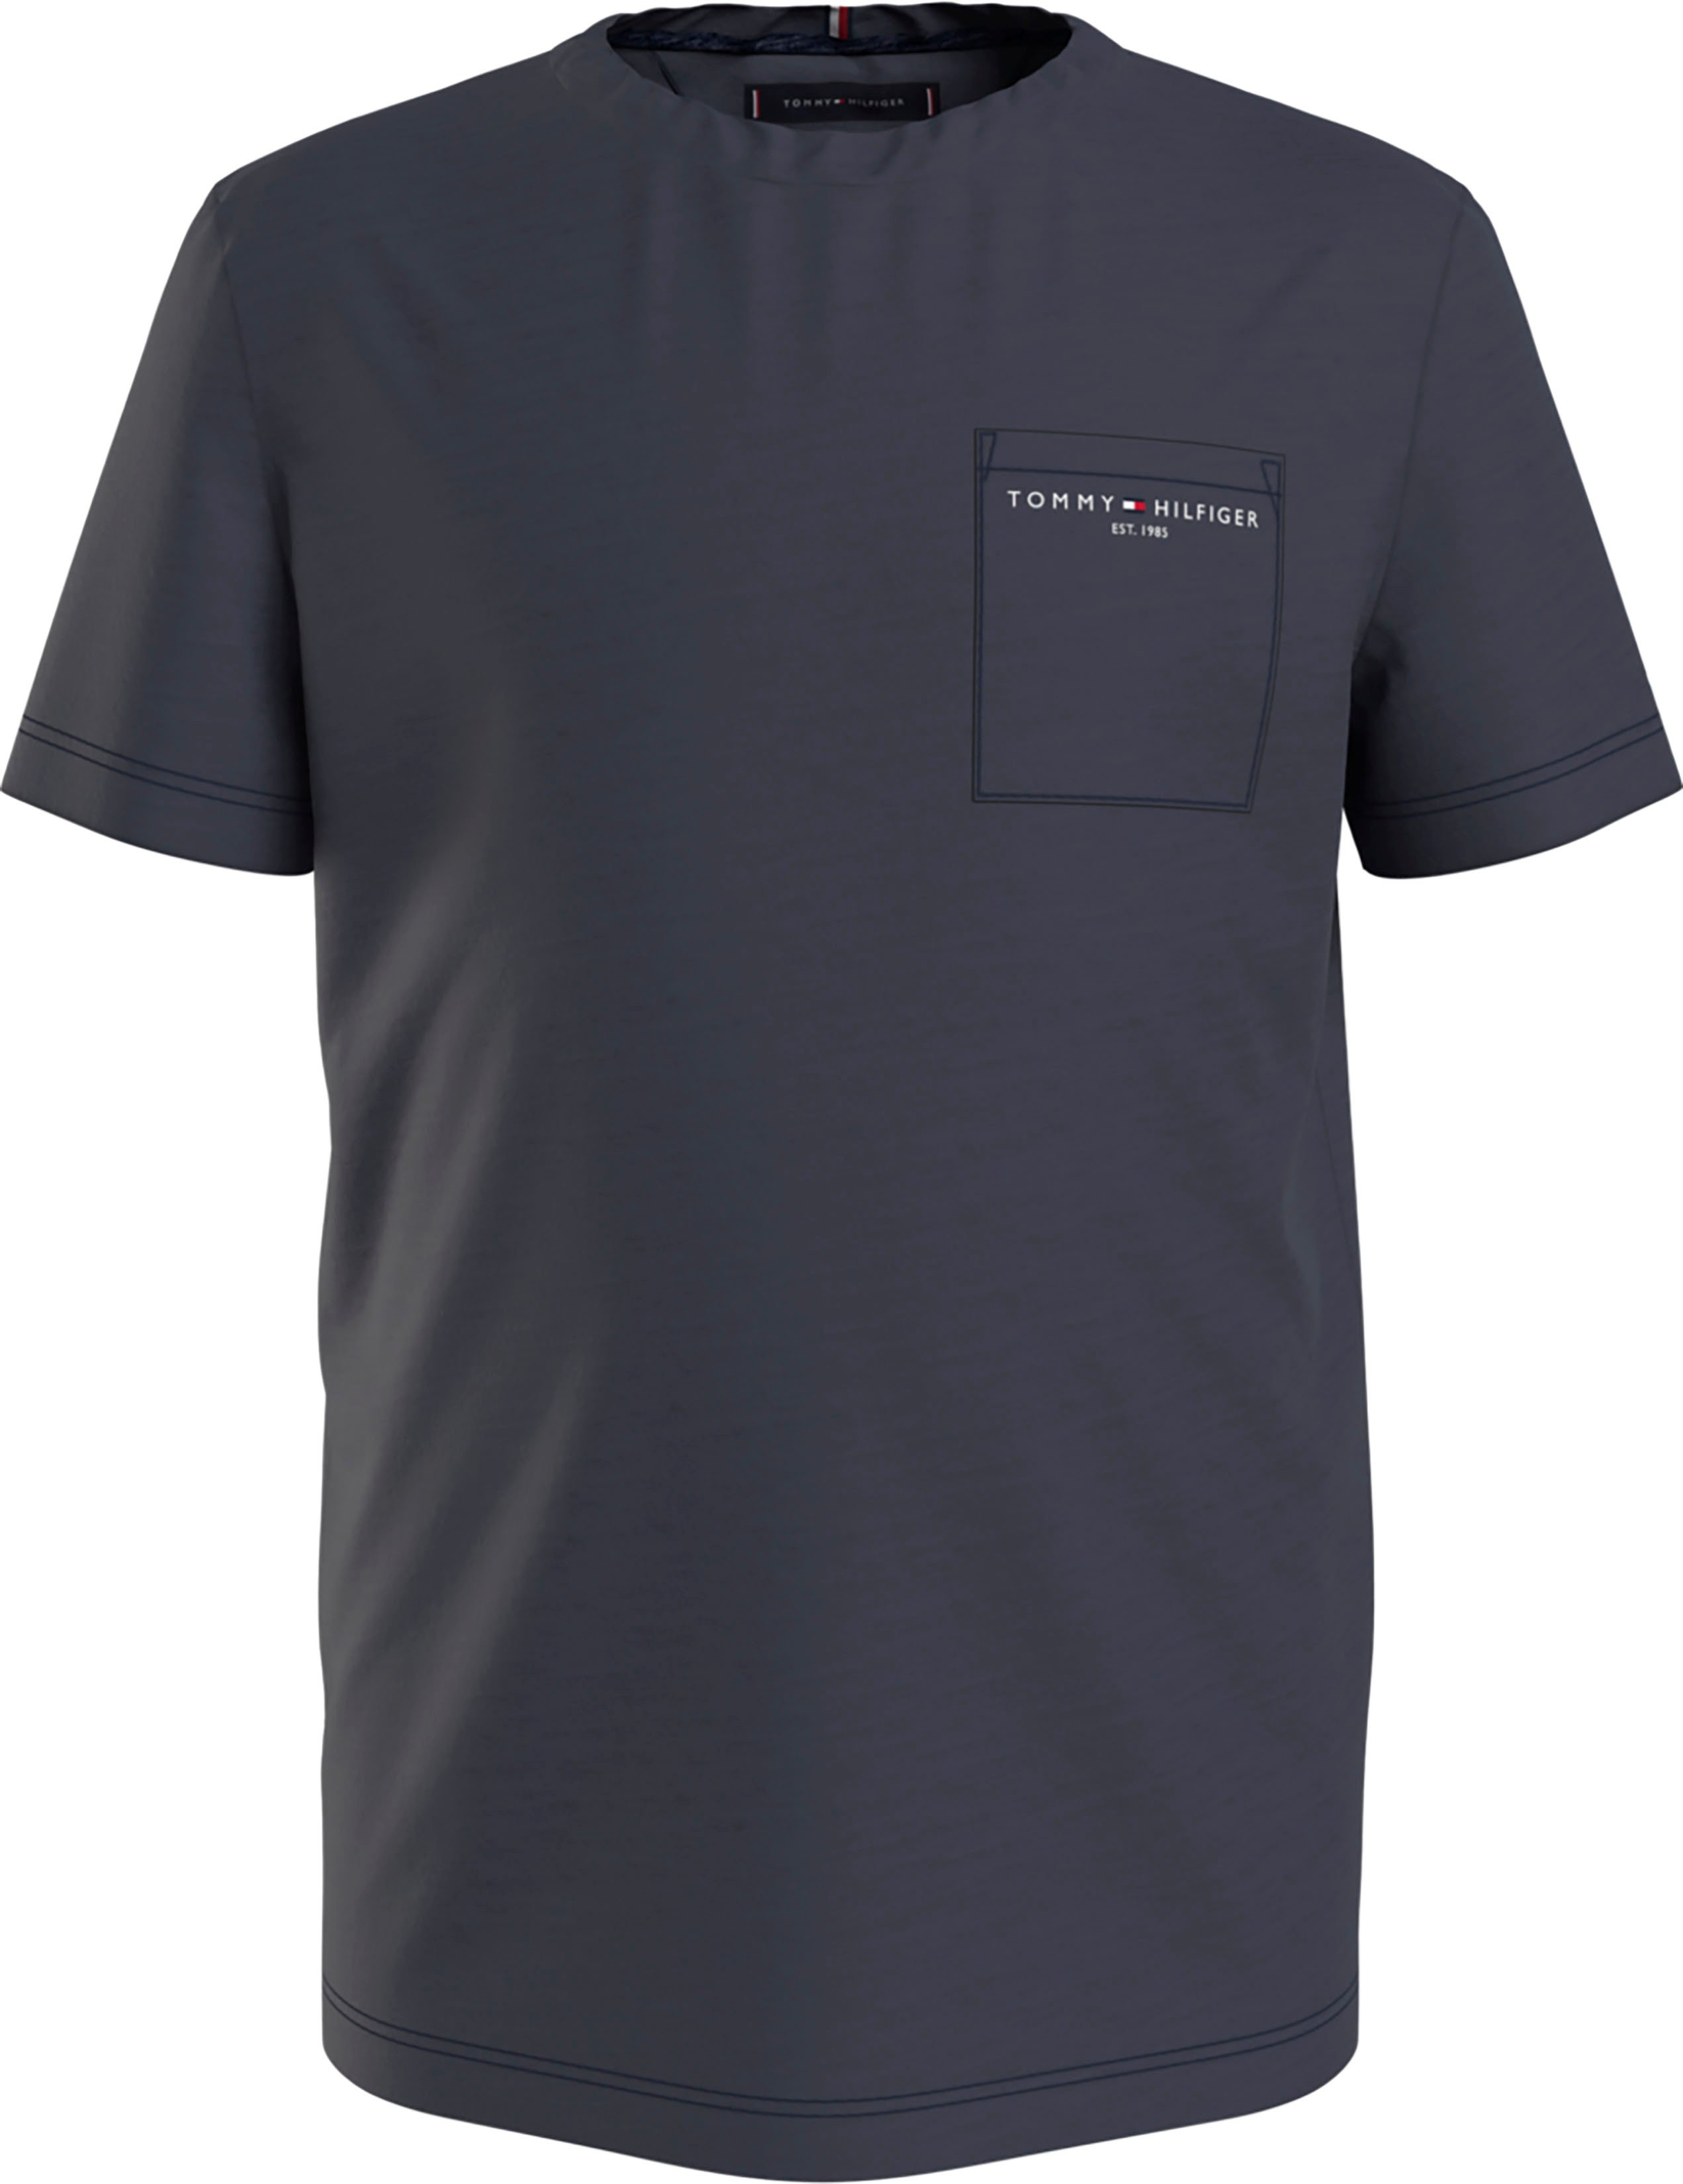 Tommy Hilfiger T-shirt Met borstzak nu online bestellen